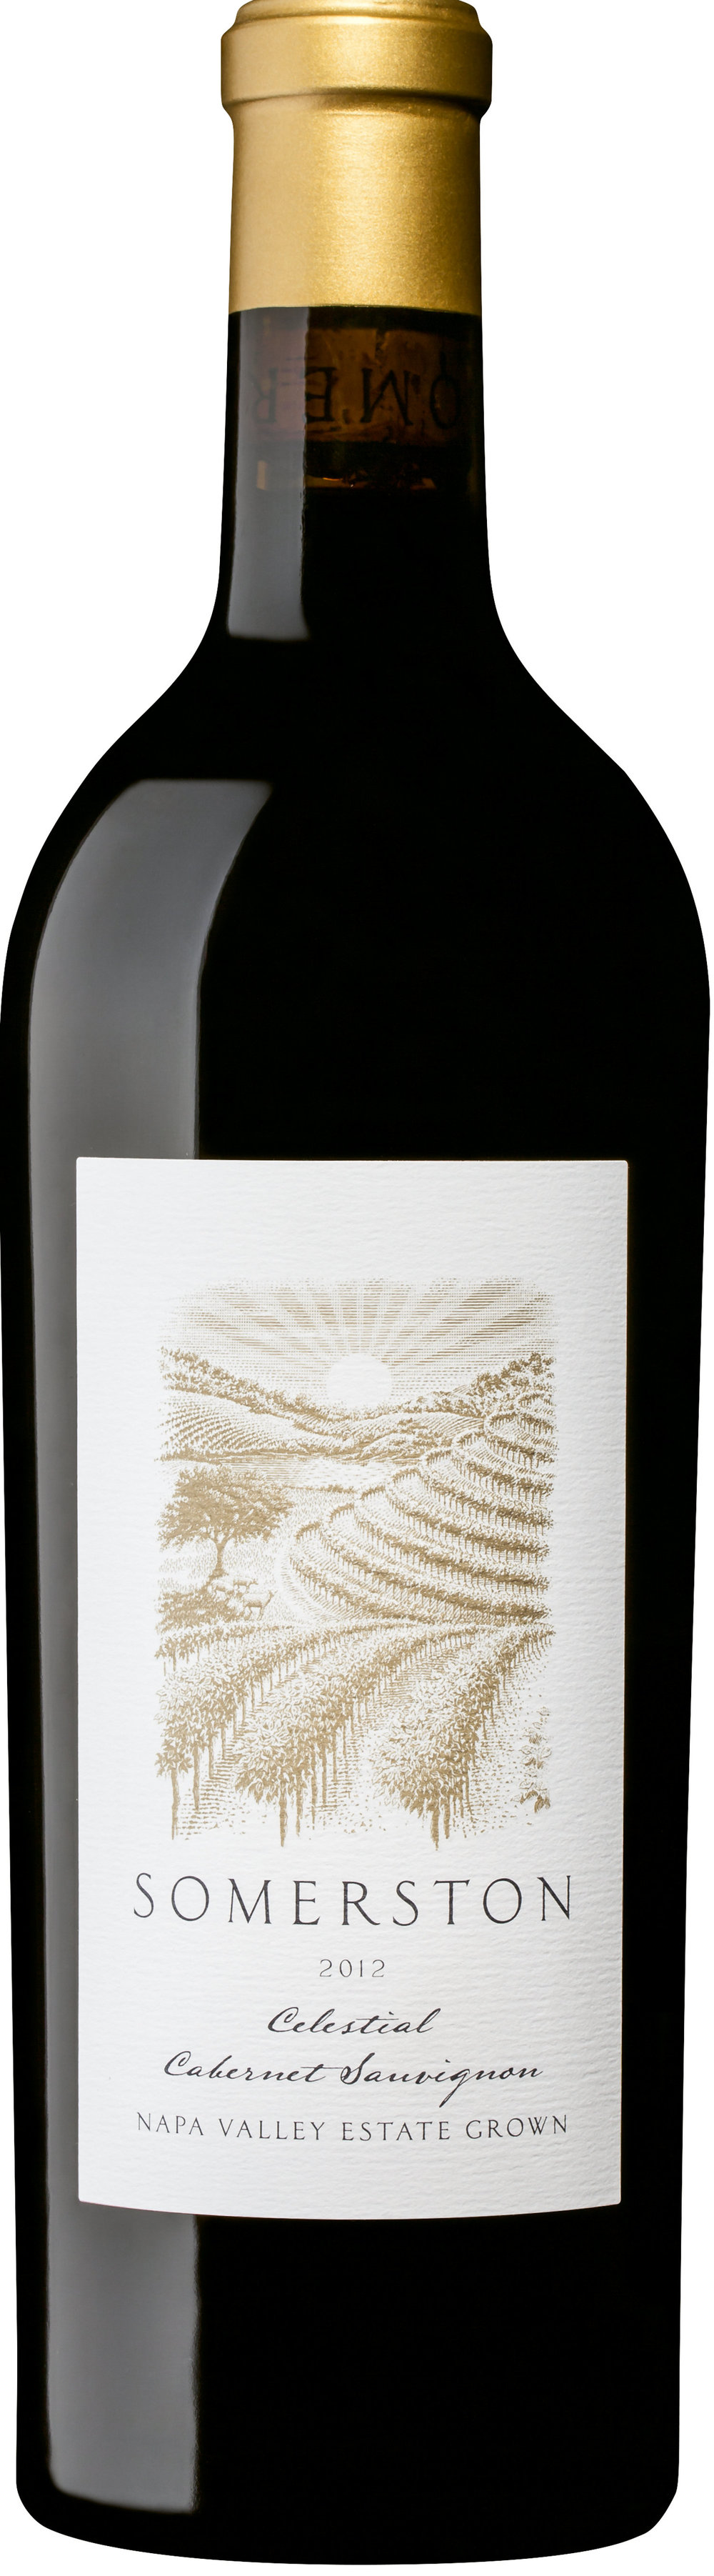 Somerston – Cabernet Sauvignon 2013, Napa